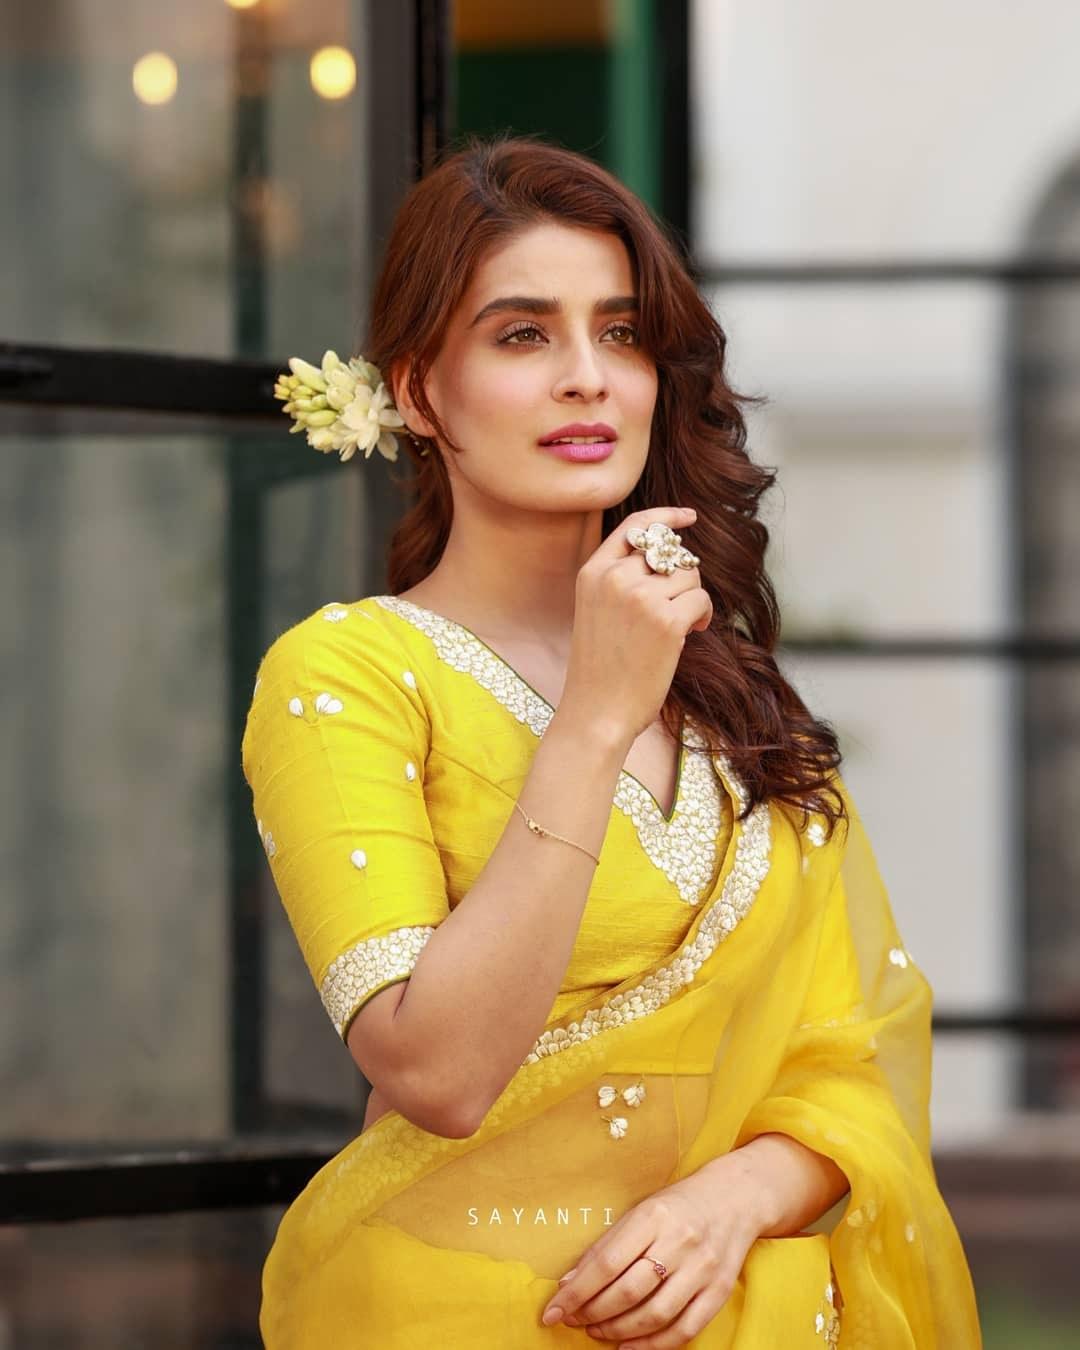 jasmine yellow blouse-Sayanti Ghosh